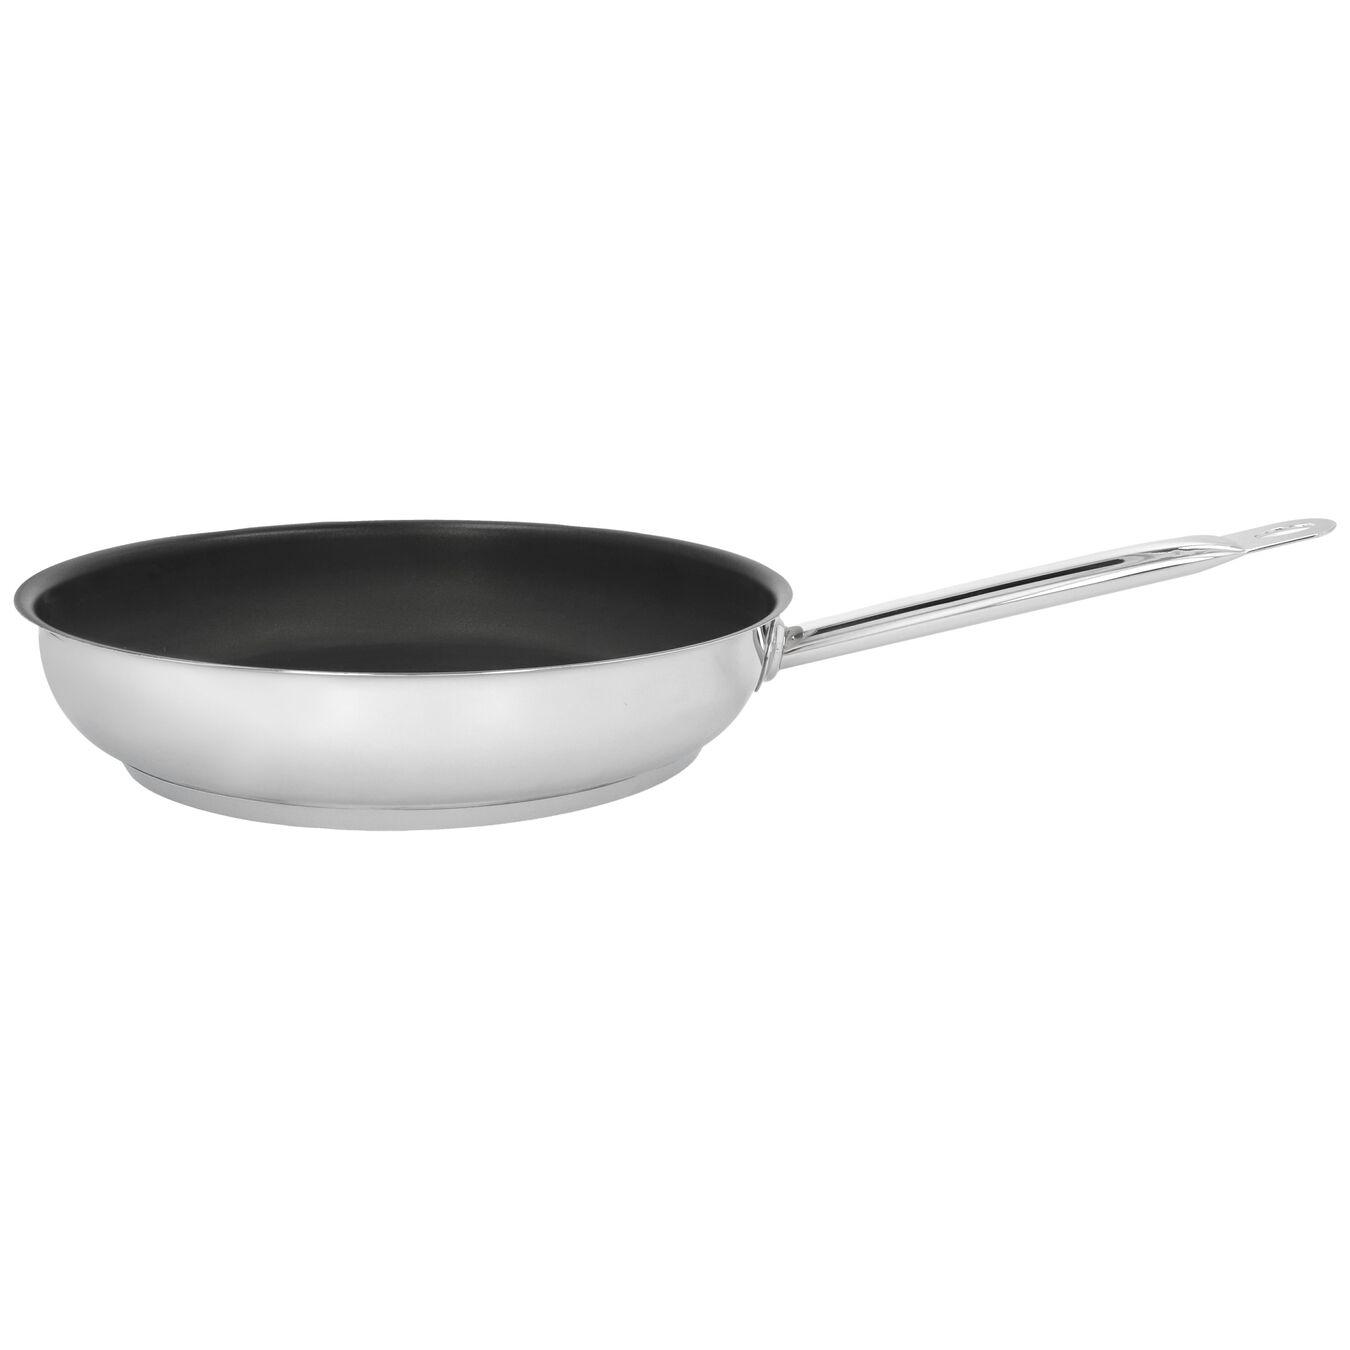 Stekpanna 32 cm, 18/10 Rostfritt stål, Silver-Svart,,large 1